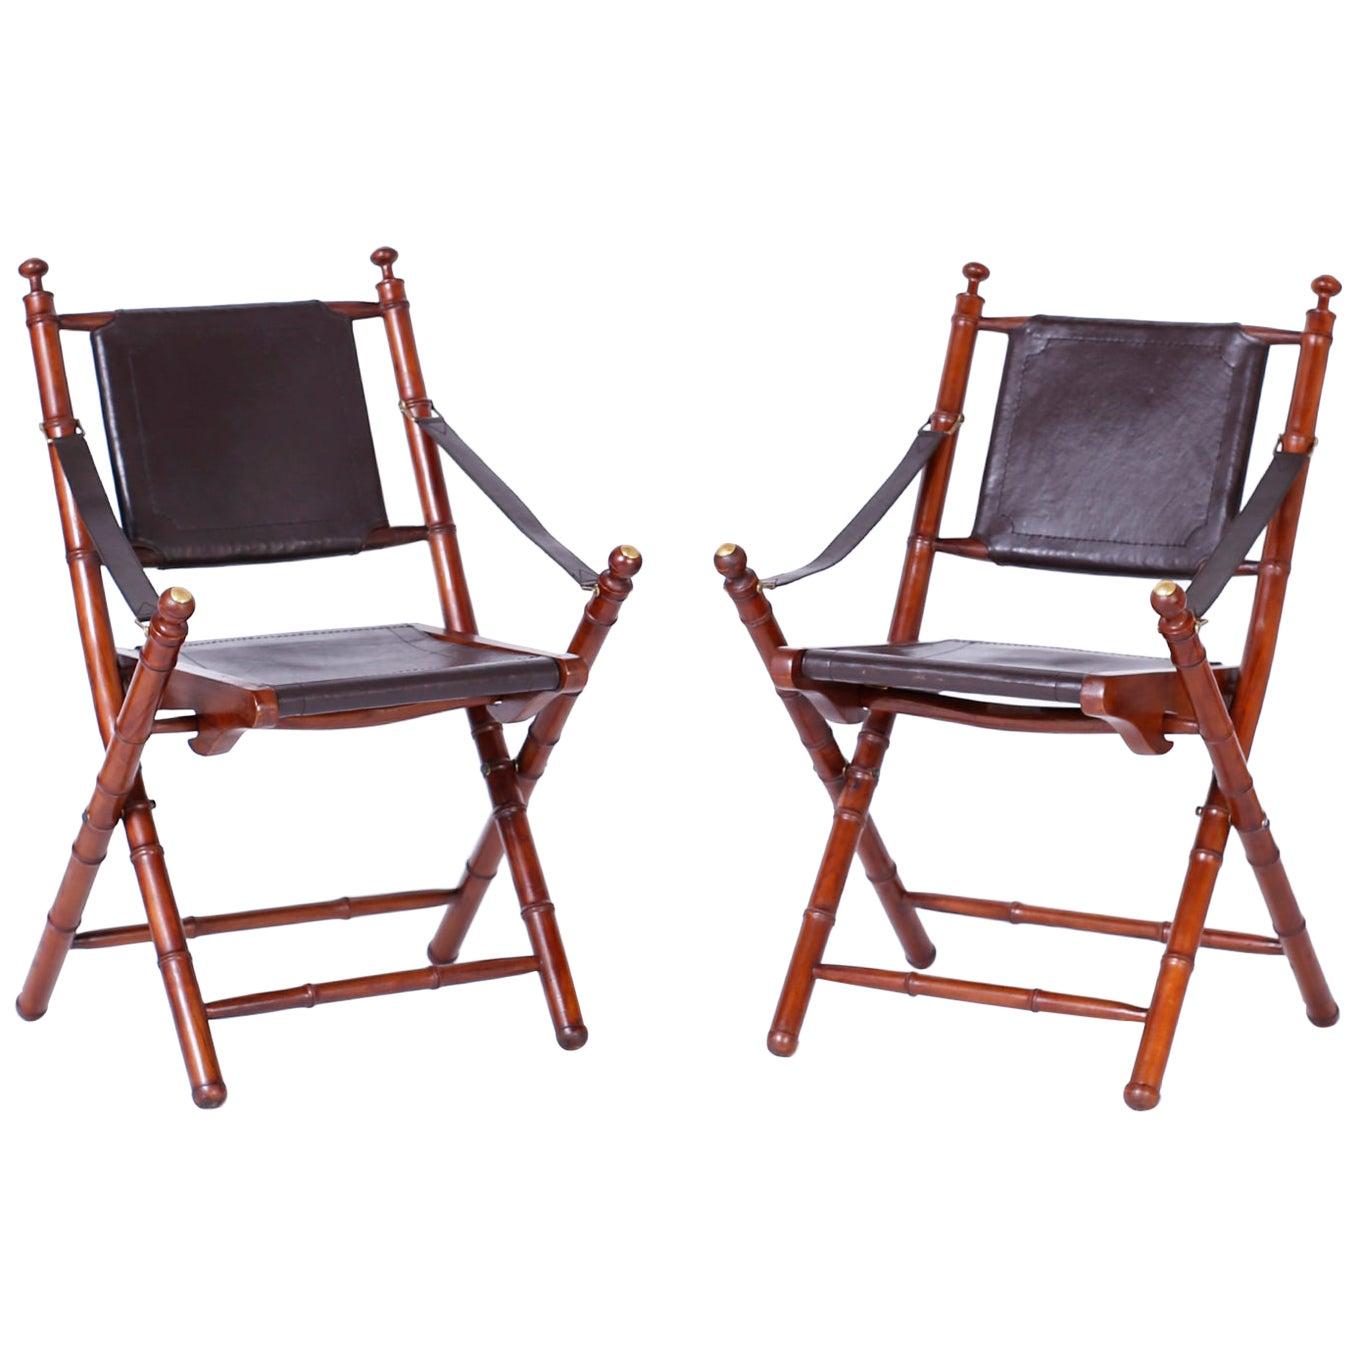 Pair of Faux Bamboo Folding Safari Chairs